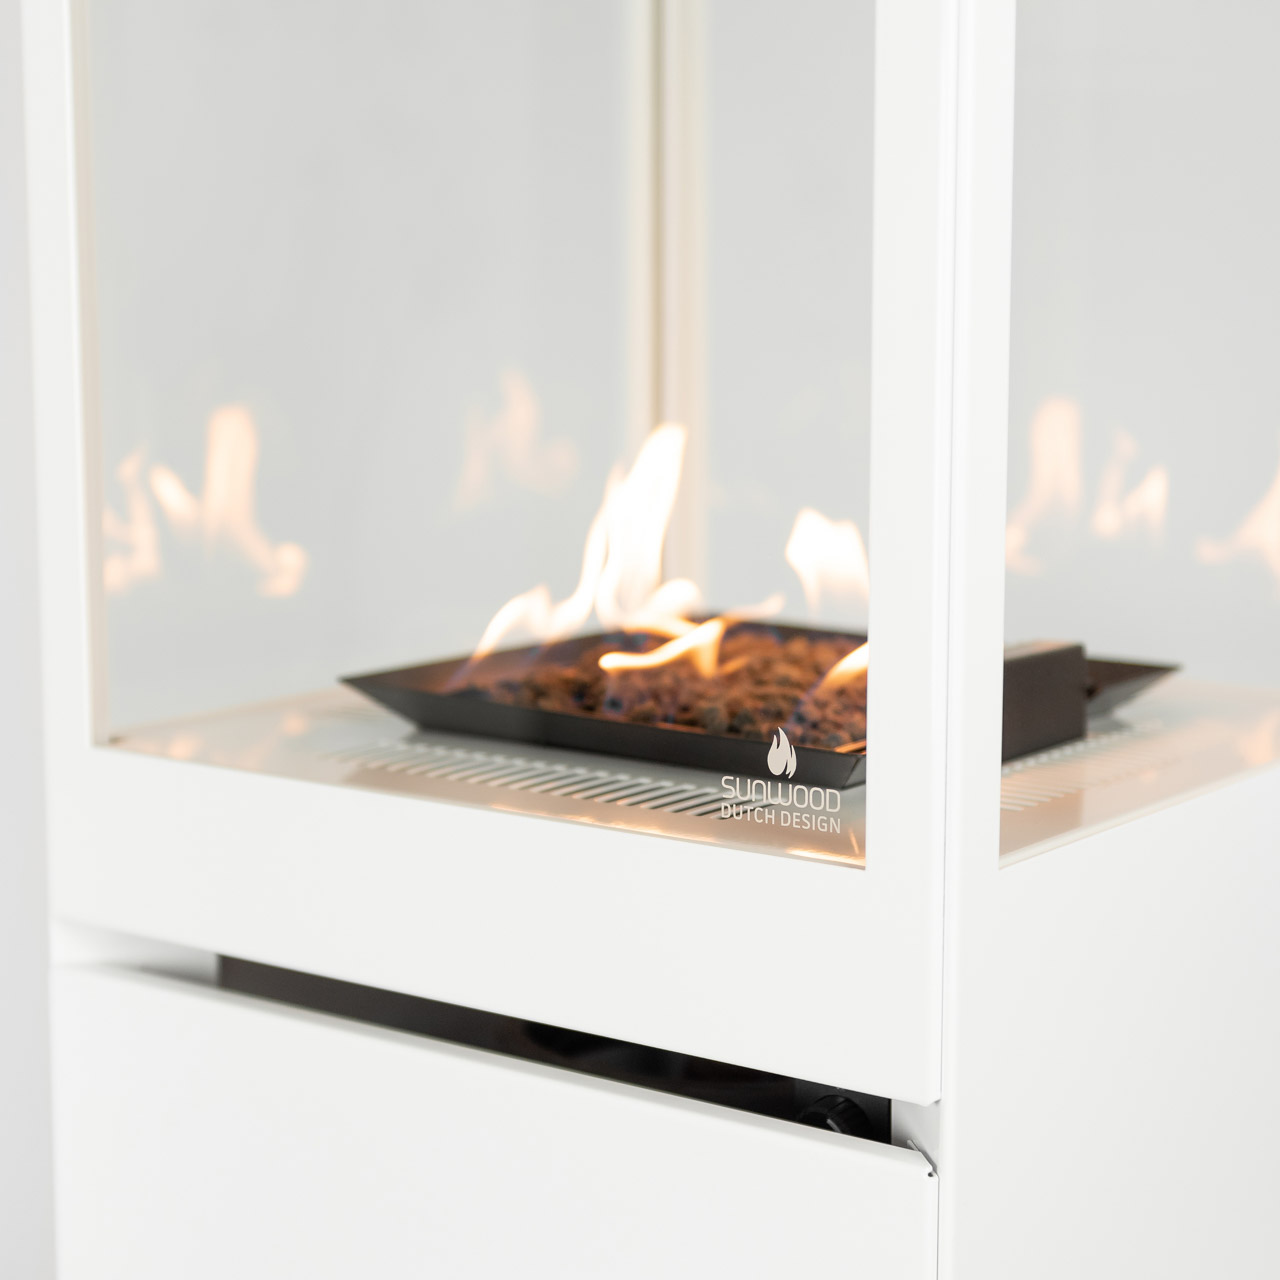 Sunwood Dutch Design Marino Buitenhaard Signal White Kleur Productfoto Vlammenspel